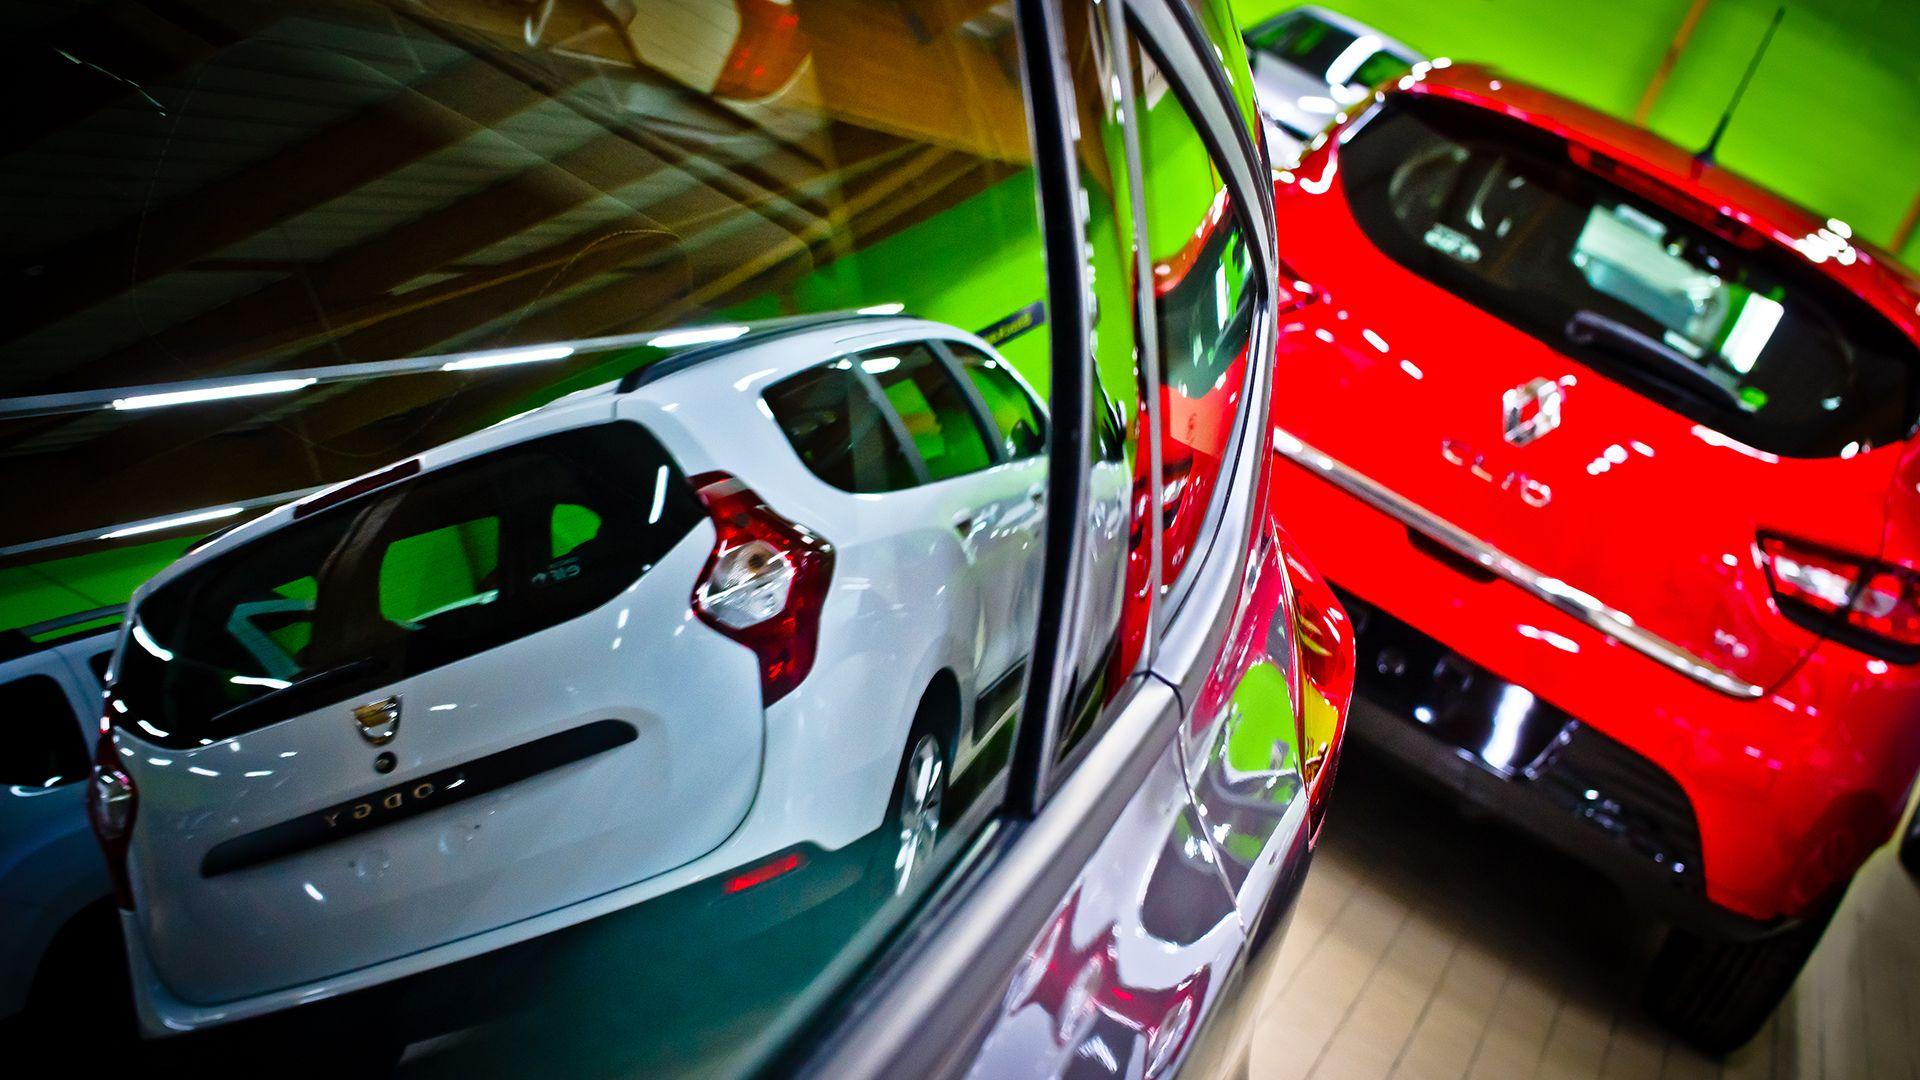 Reflets des voitures au showroom Car, Sports car, Vehicles